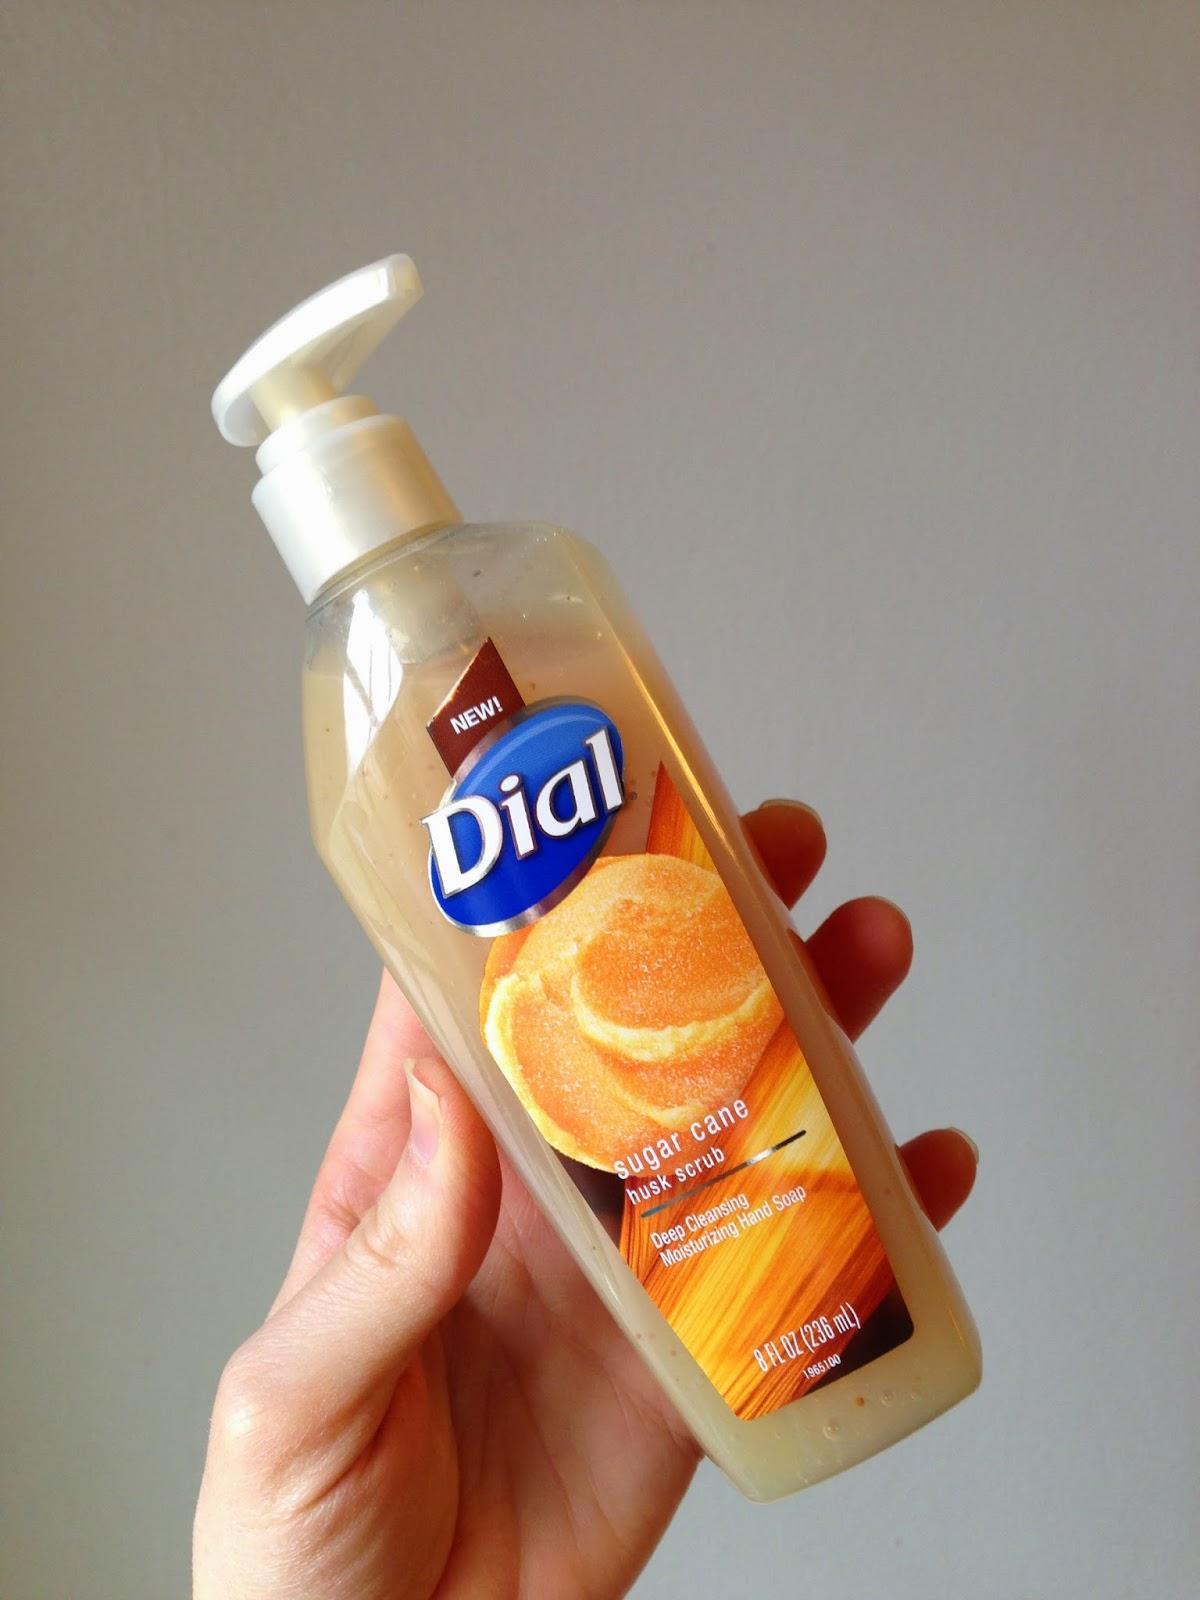 Dial Sugar Cane Husk Scrub giveaway (ends 4/6/15)